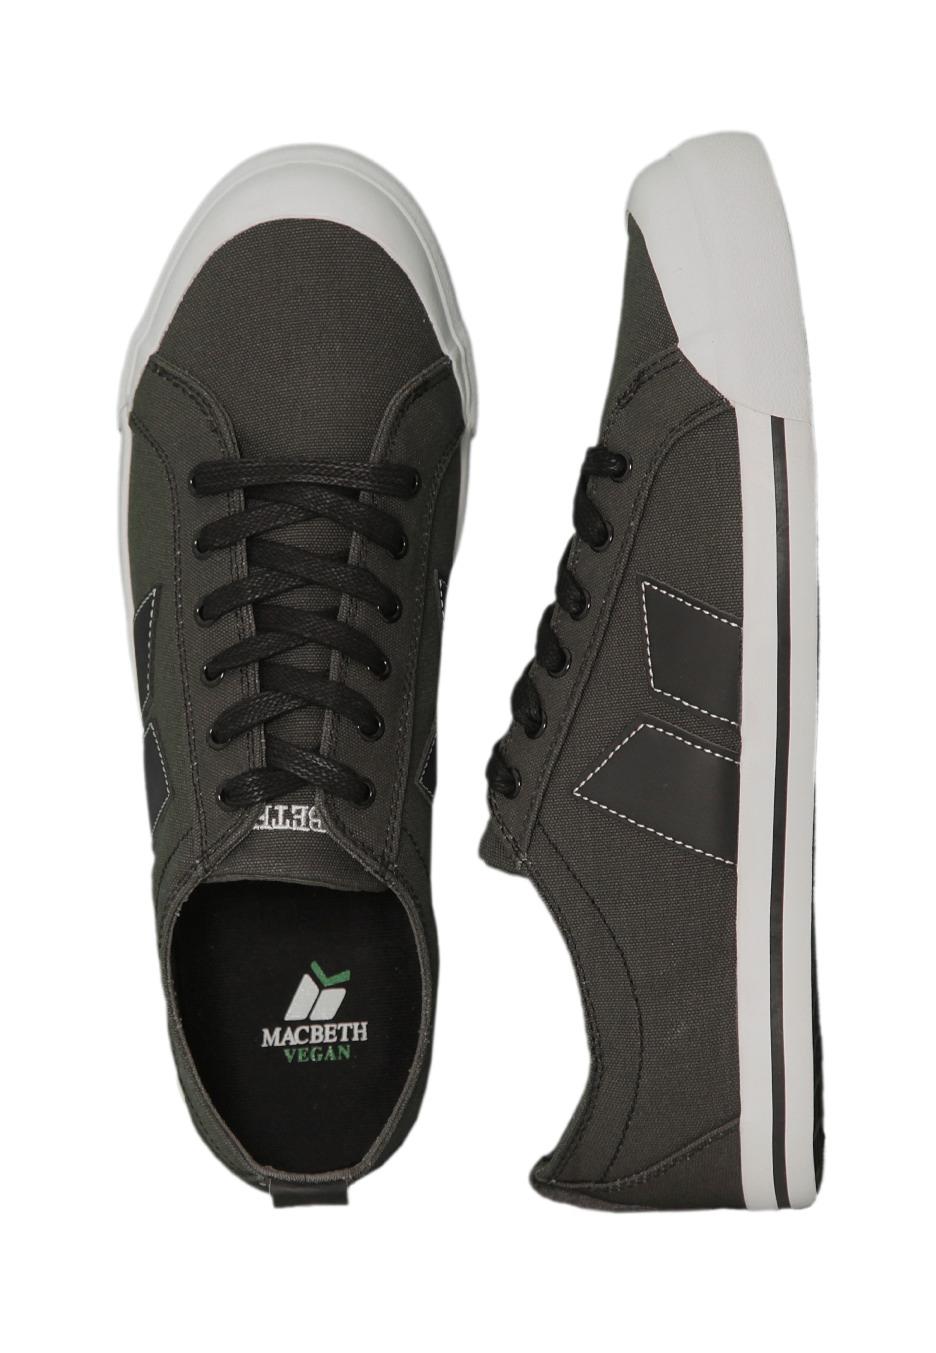 . Macbeth   Eliot Dark Grey Black   Shoes   Impericon com Worldwide